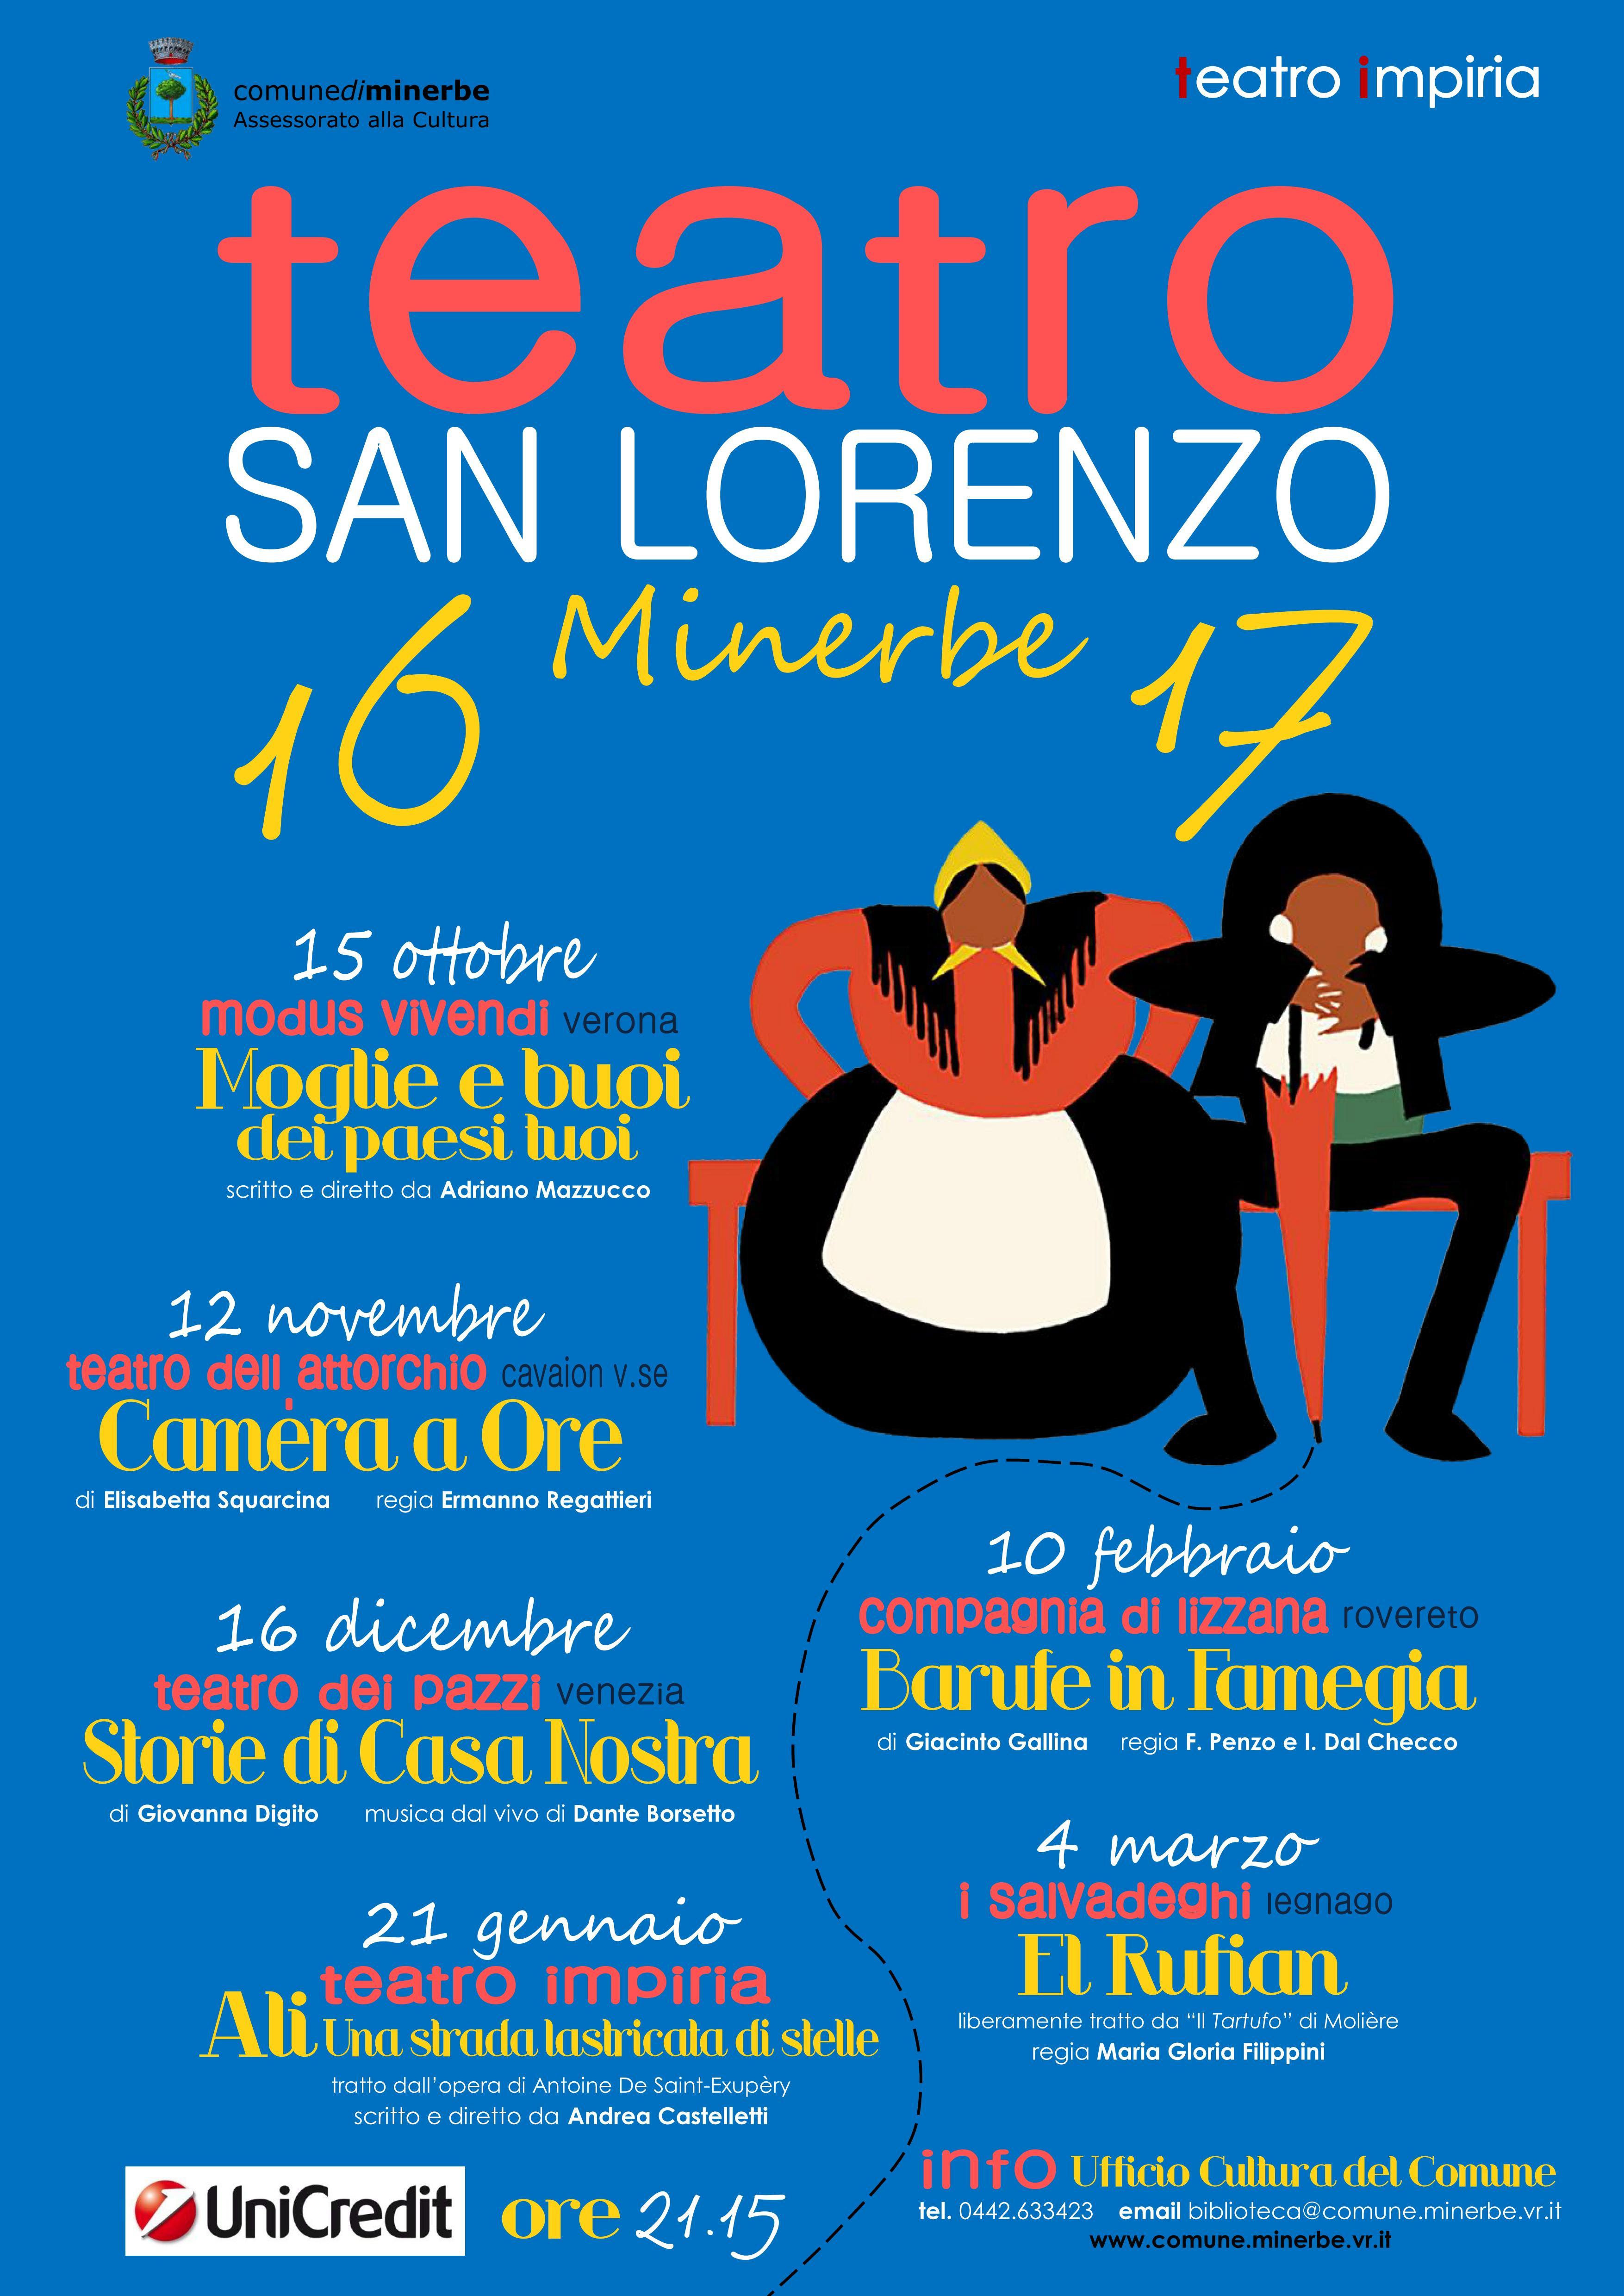 teatro-impiria-verona-minerbe-san-lorenzo-teatro-commedia-brillante-dialettale-verona